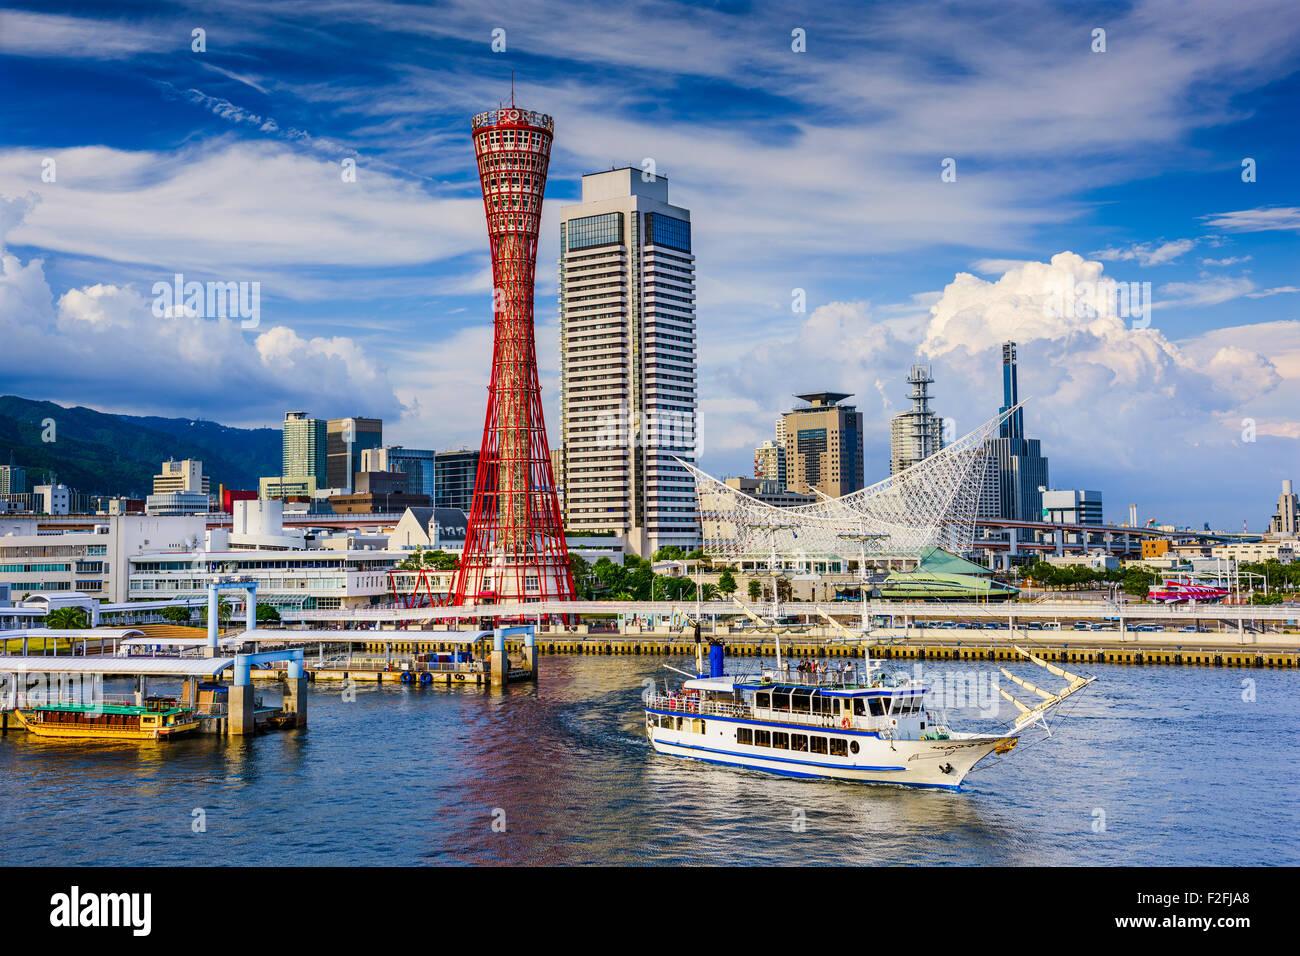 Kobe, Japan skyline at the port. Stock Photo